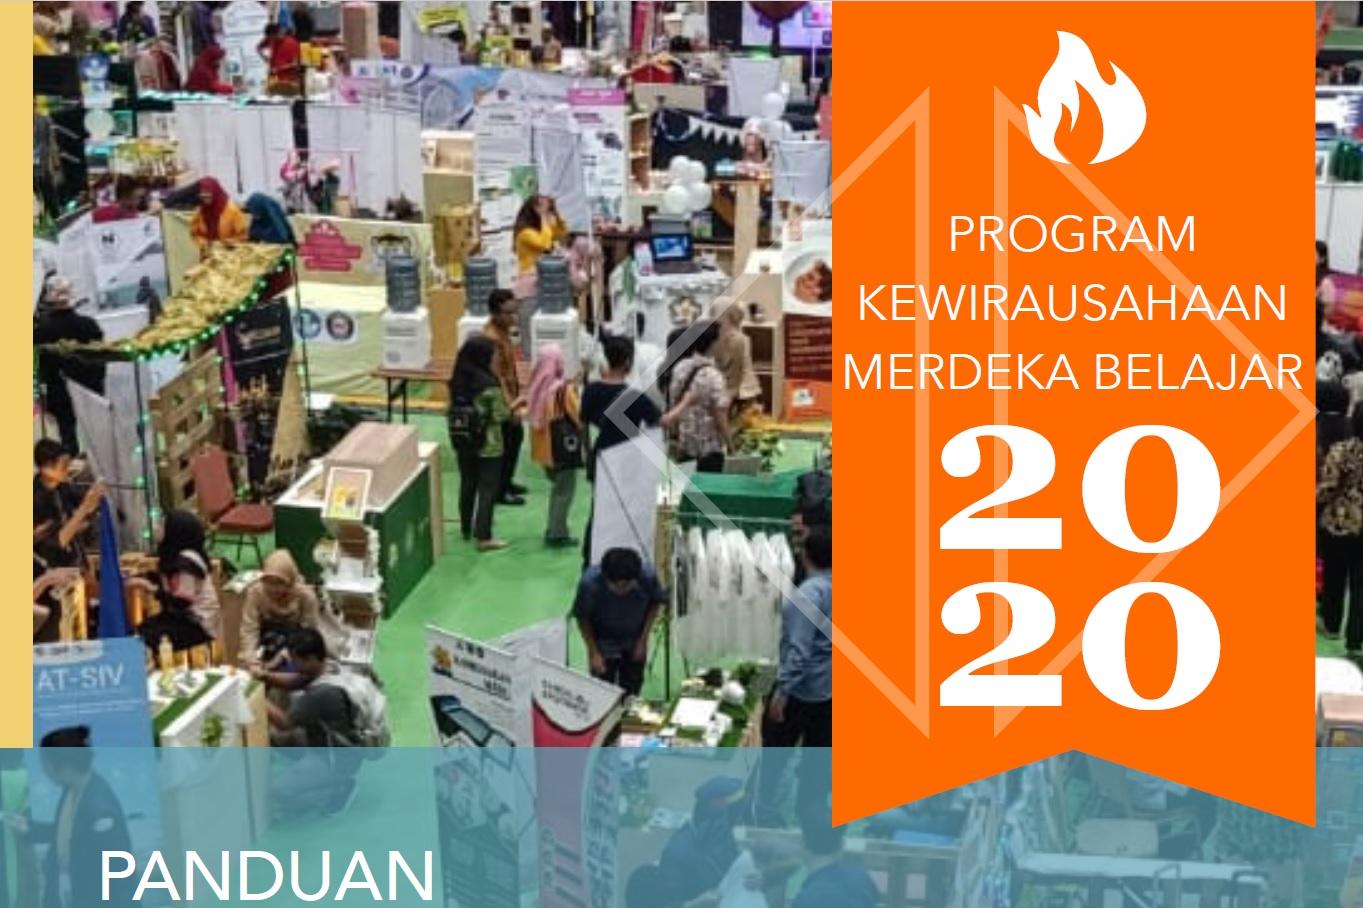 PANDUAN PROGRAM KEWIRAUSAHAAN MERDEKA BELAJAR 2020